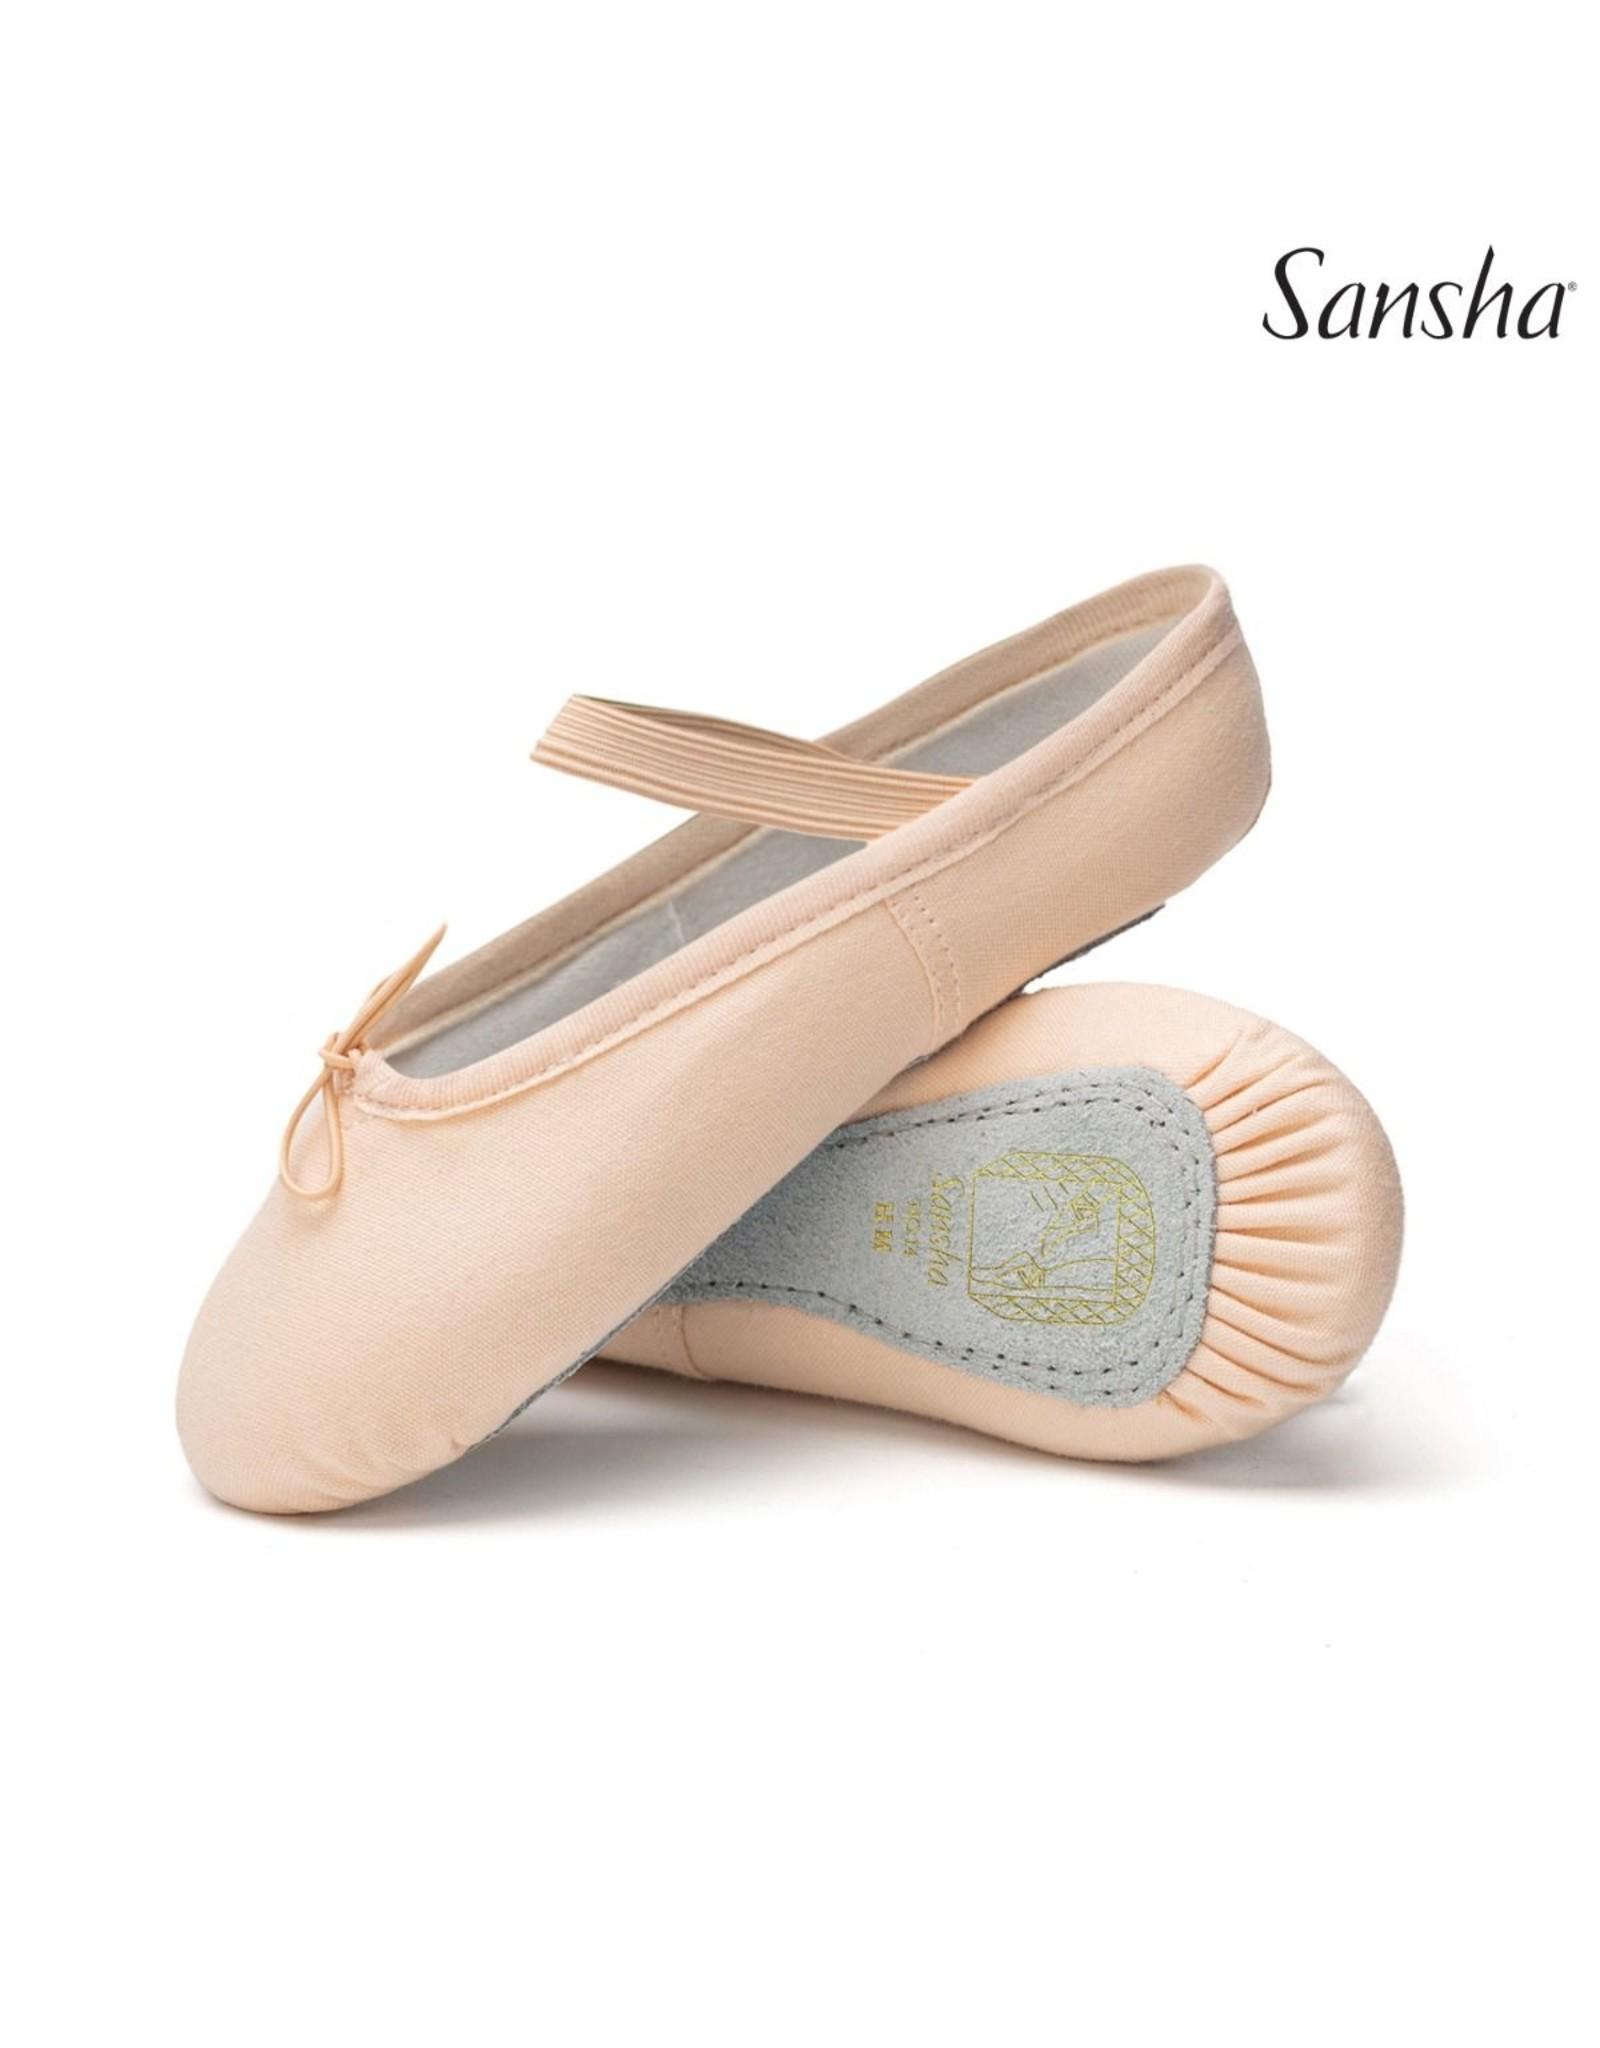 SANSHA FULL SOLE CANVAS BALLET SLIPPER